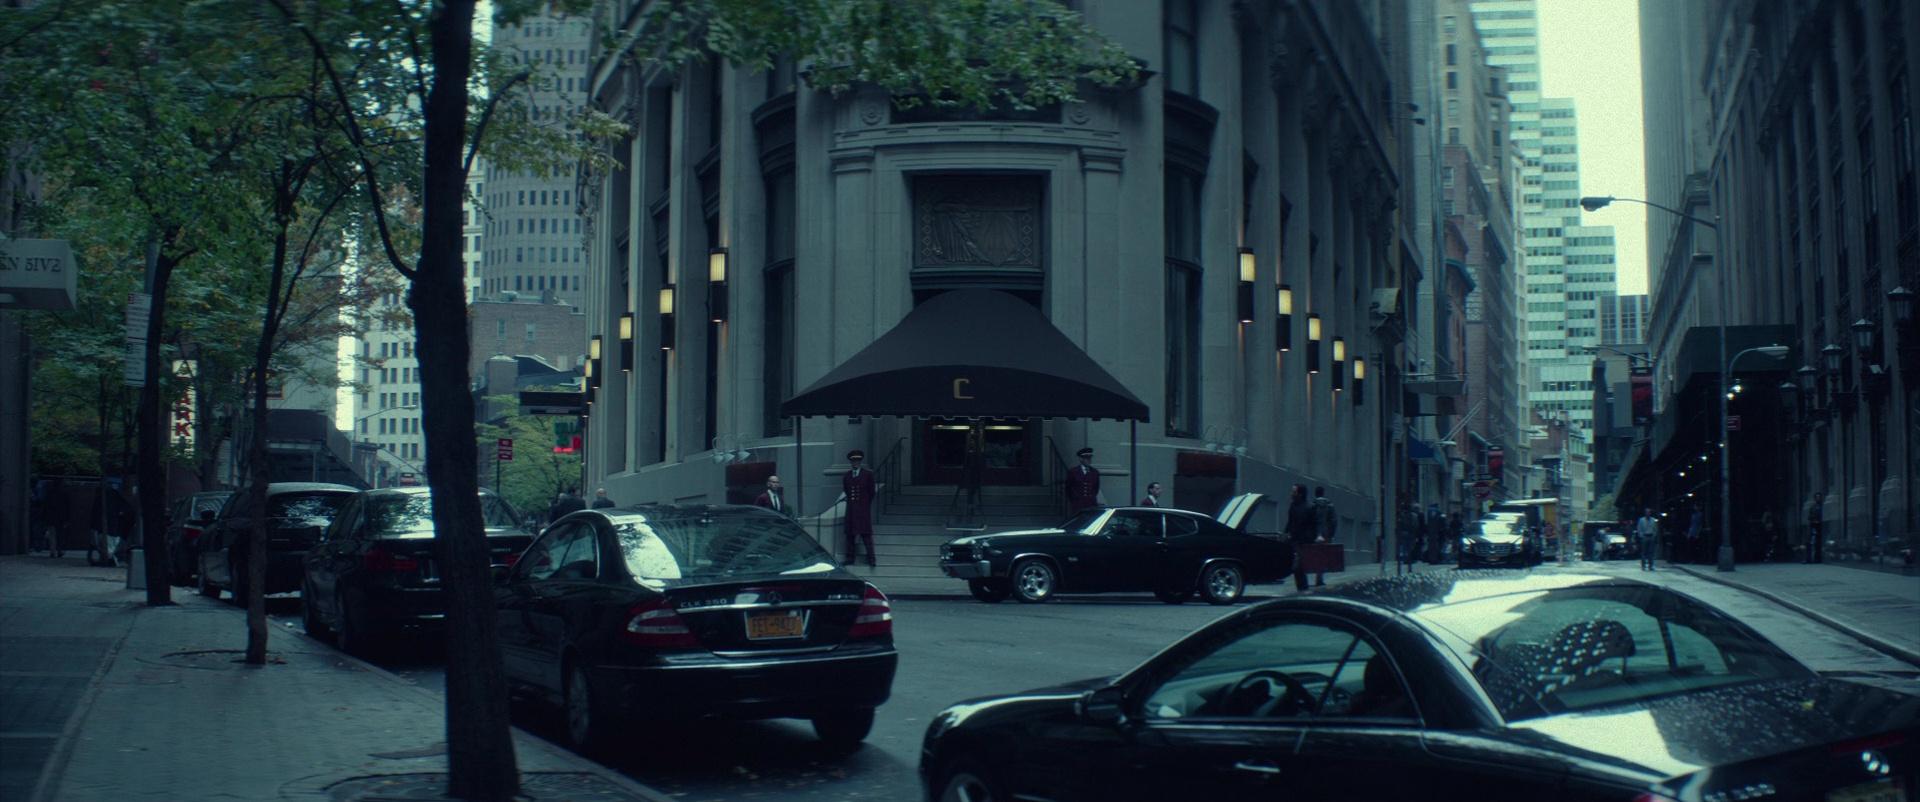 Continental Hotel | The John Wicki | Fandom